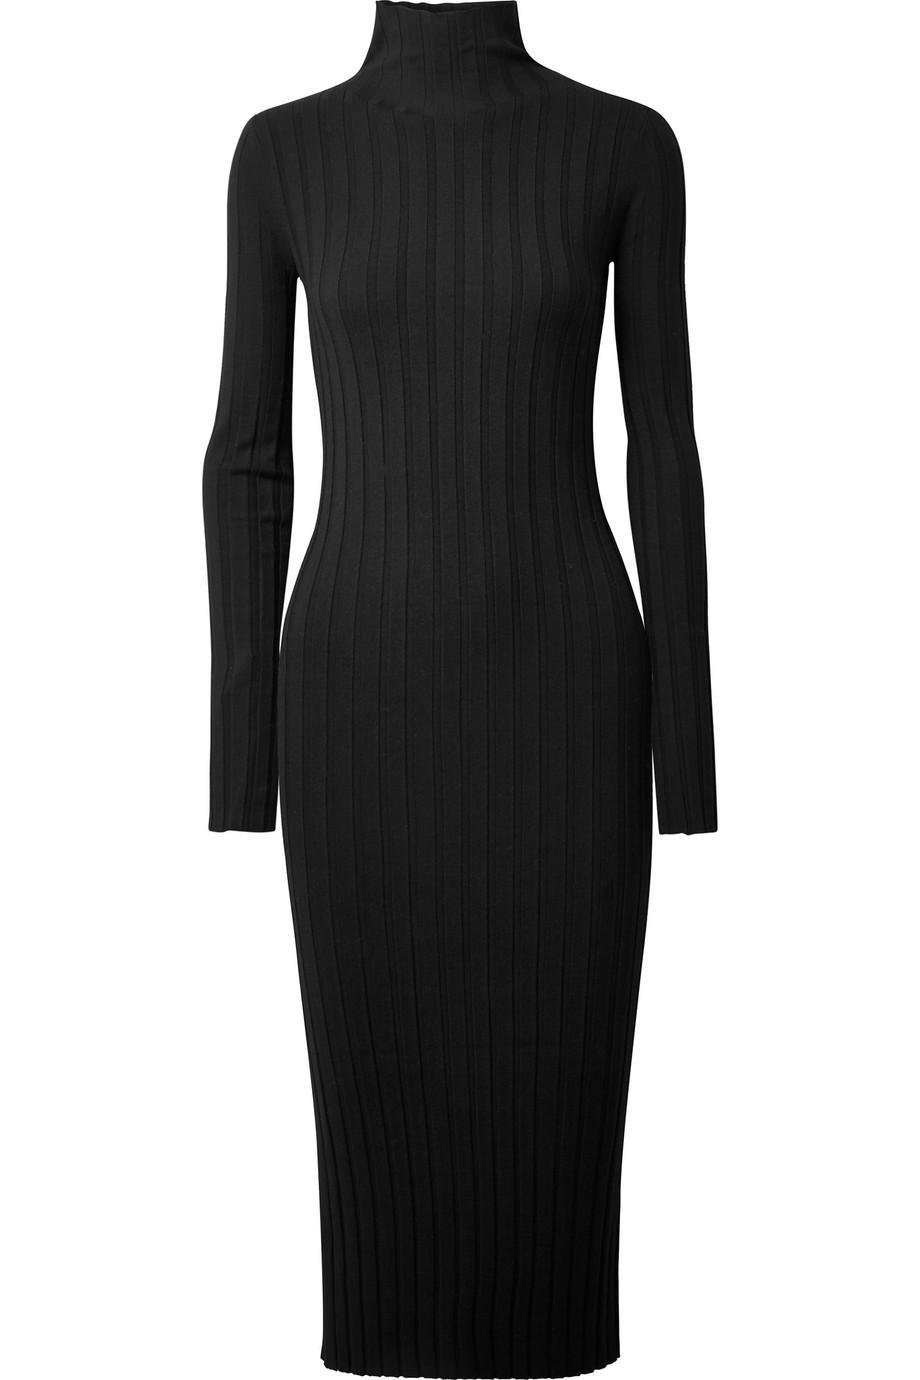 a6b01136e5a Lyst - Theory Woman Ribbed-knit Turtleneck Midi Dress Black in Black